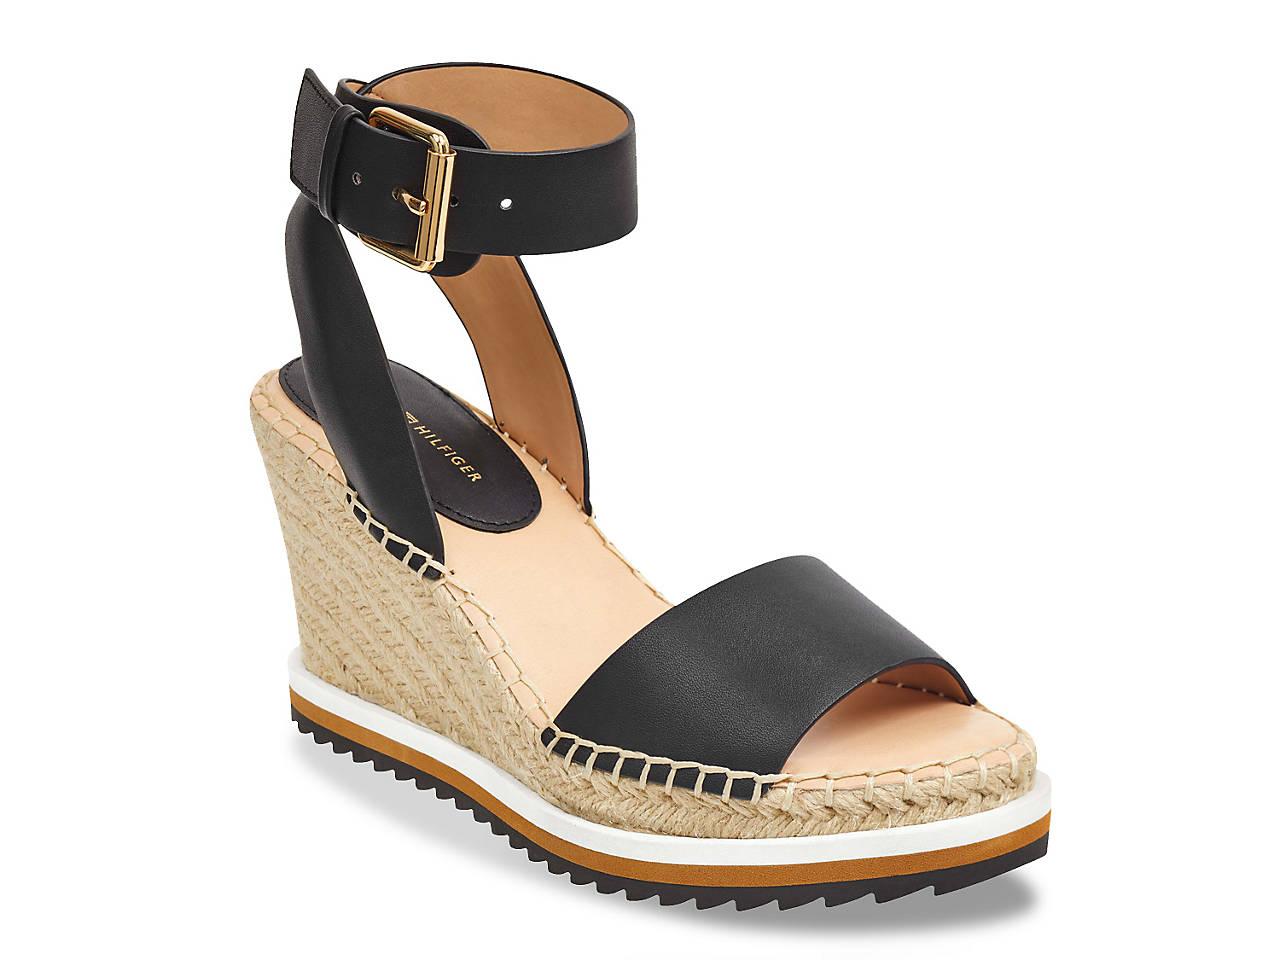 e13a24a14cc Tommy Hilfiger Yaslin 2 Wedge Sandal Men s Shoes